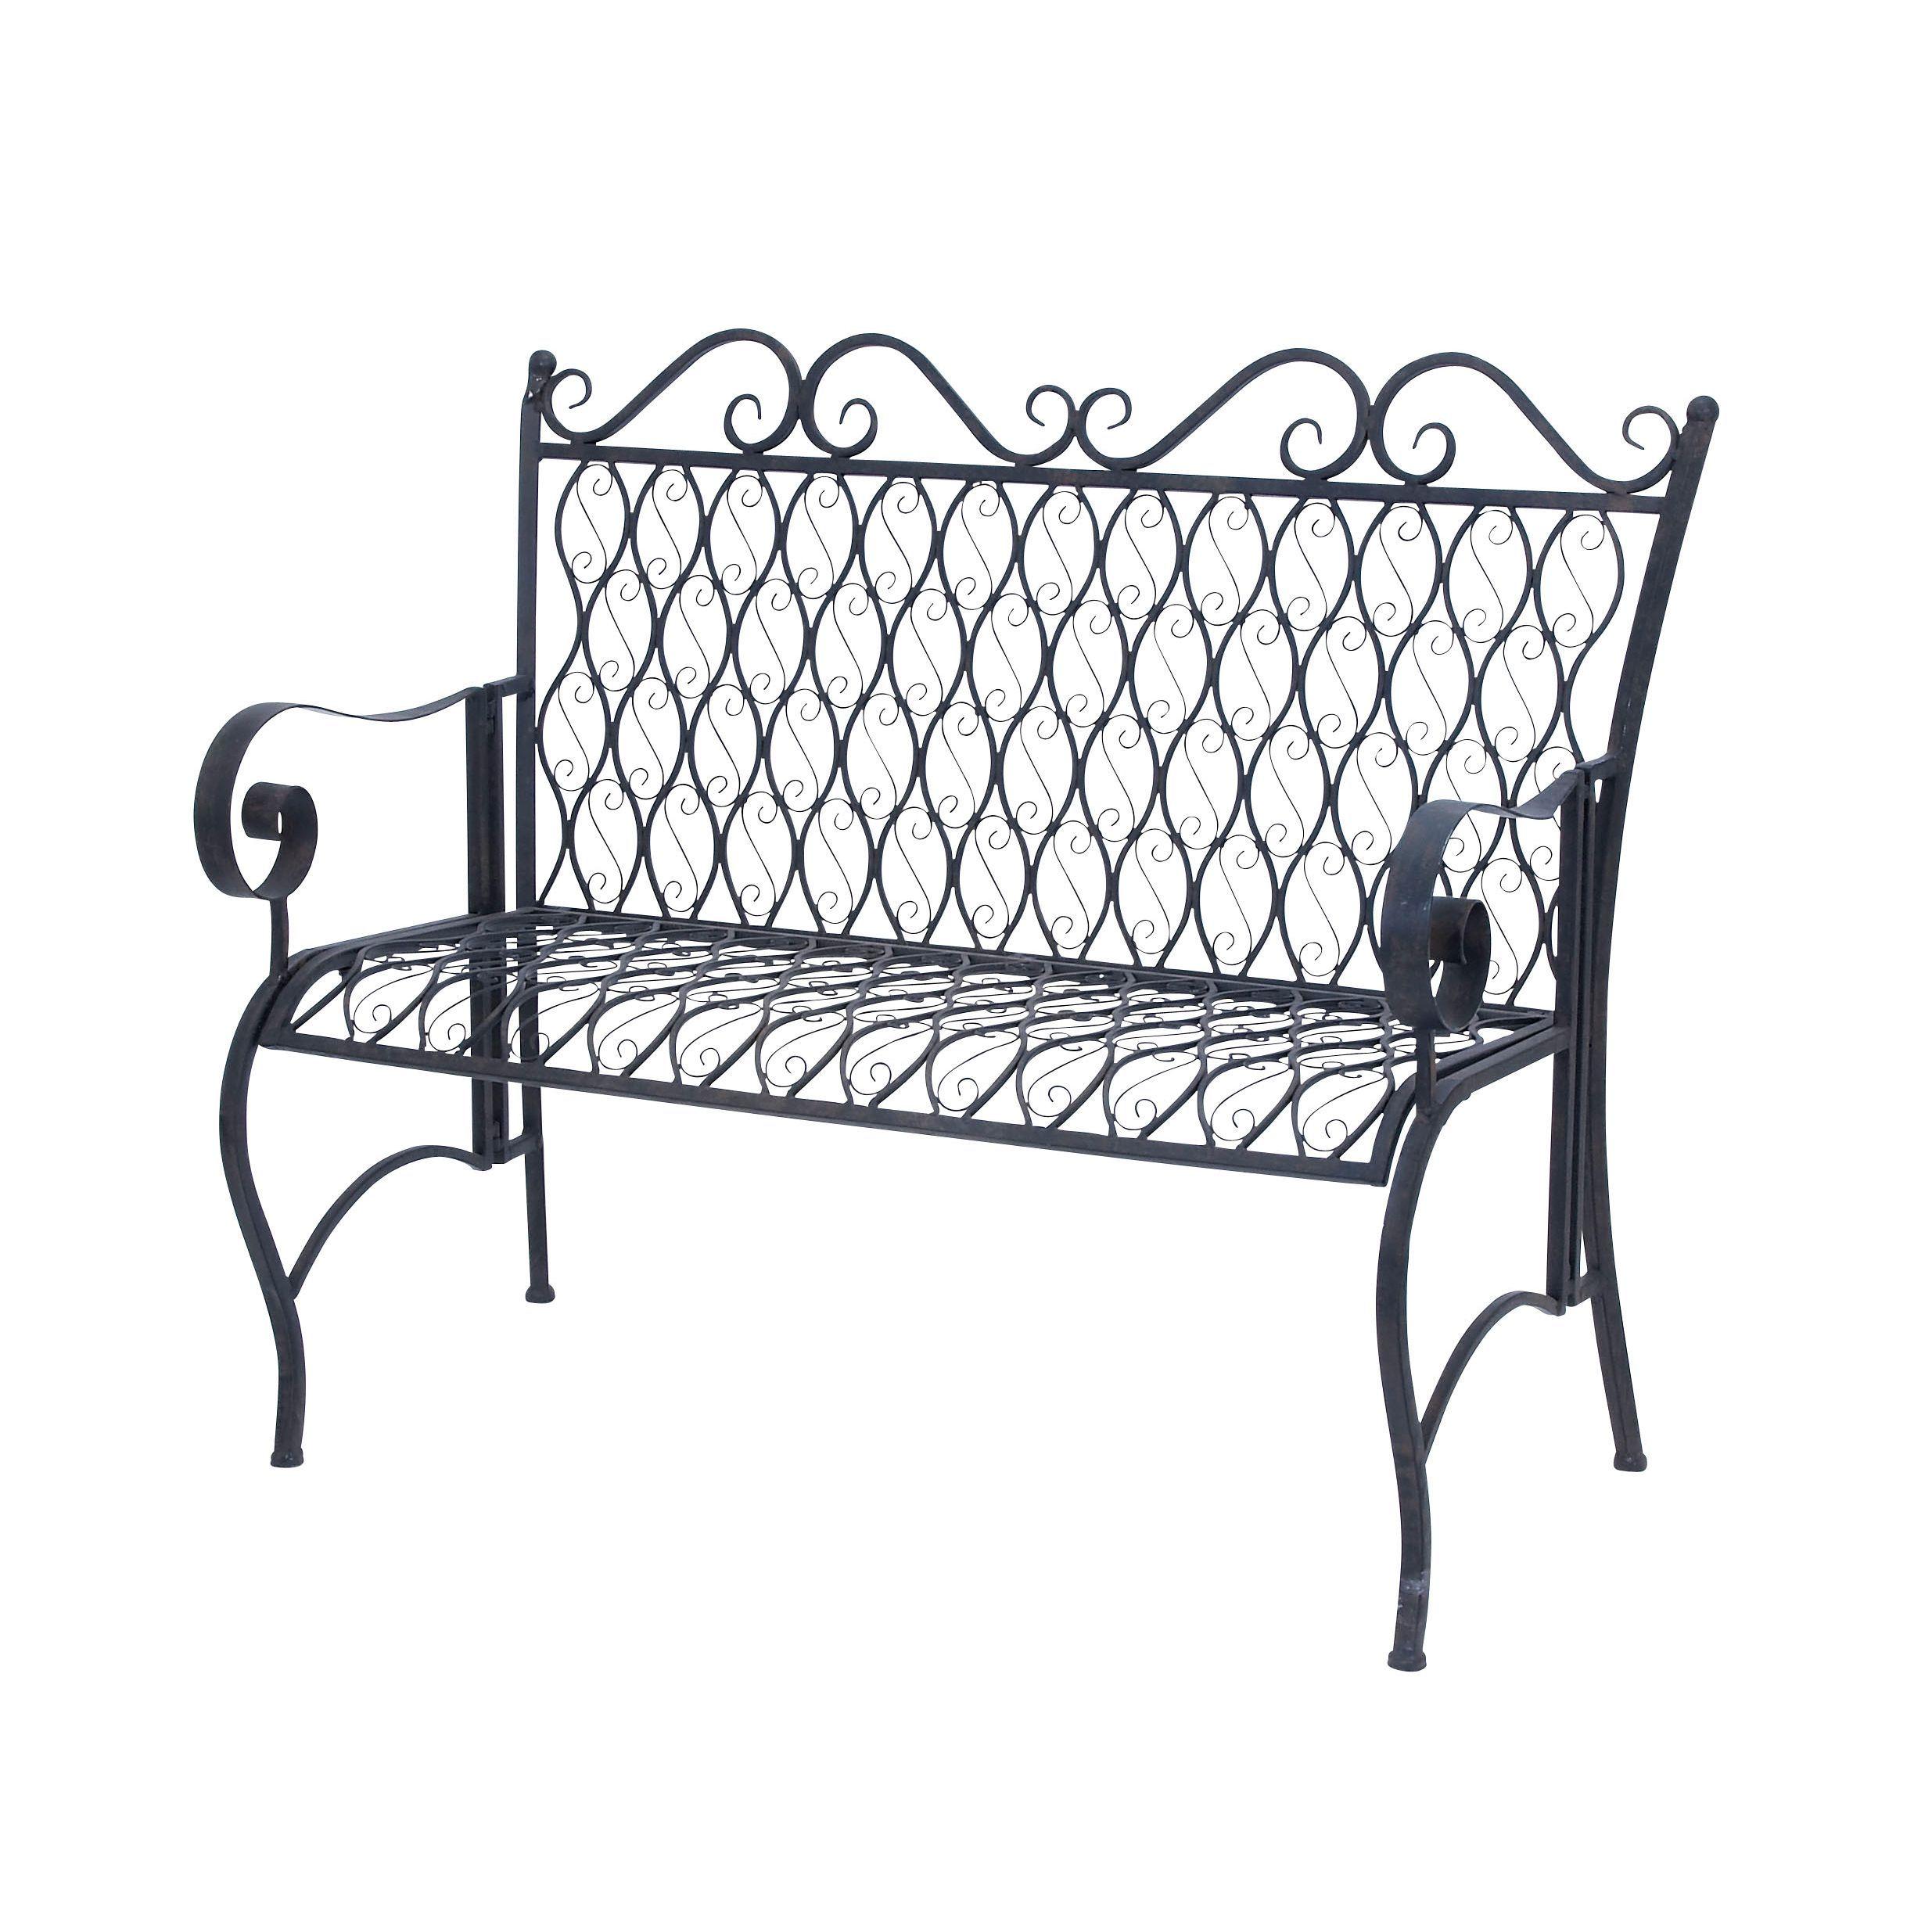 Studio 350 Black Iron Oval Bench Patio Furniture